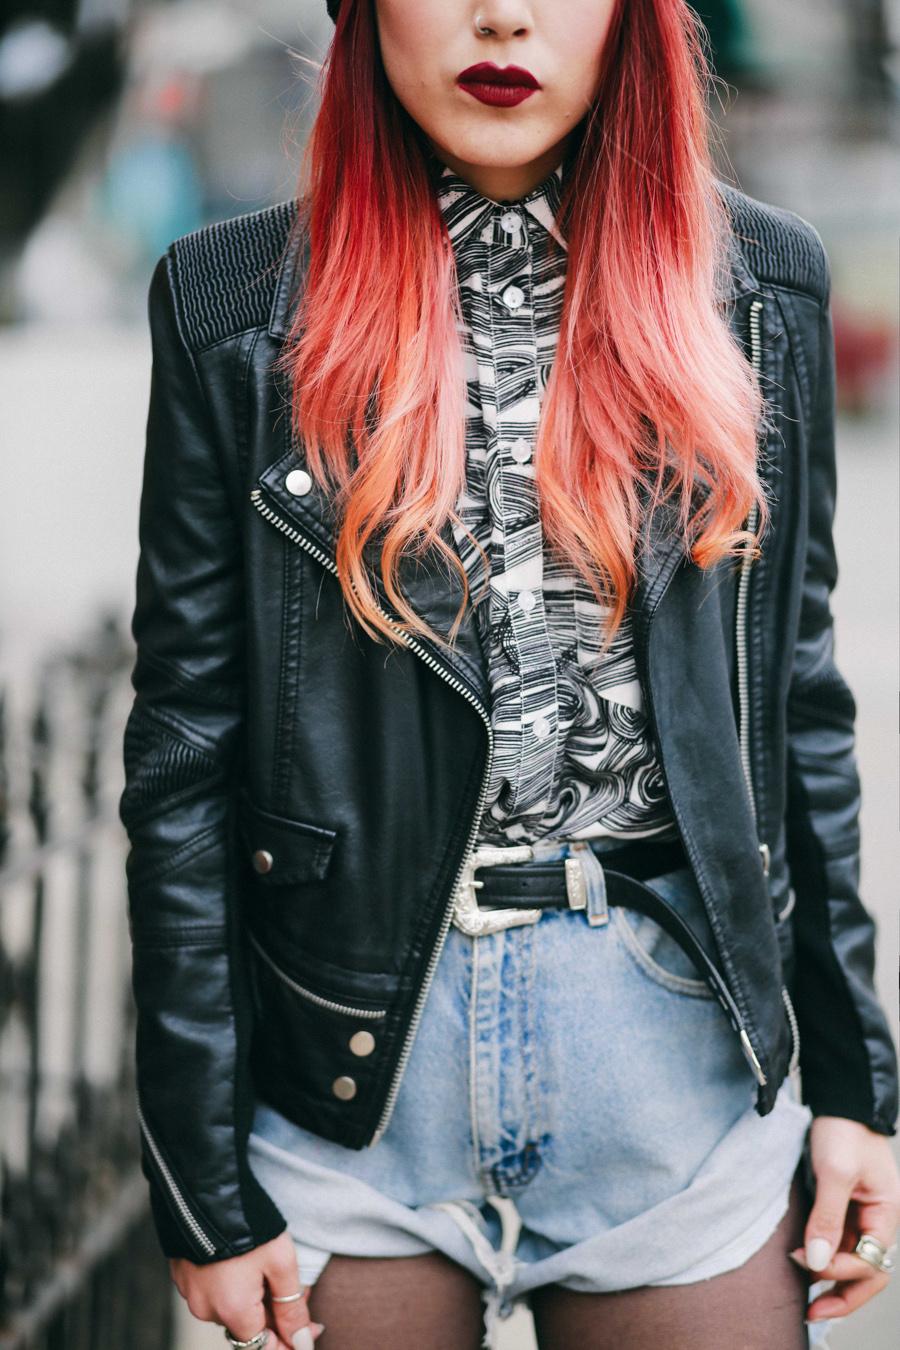 Le menanggung senang celana pendek denim vintage dan biker jacket